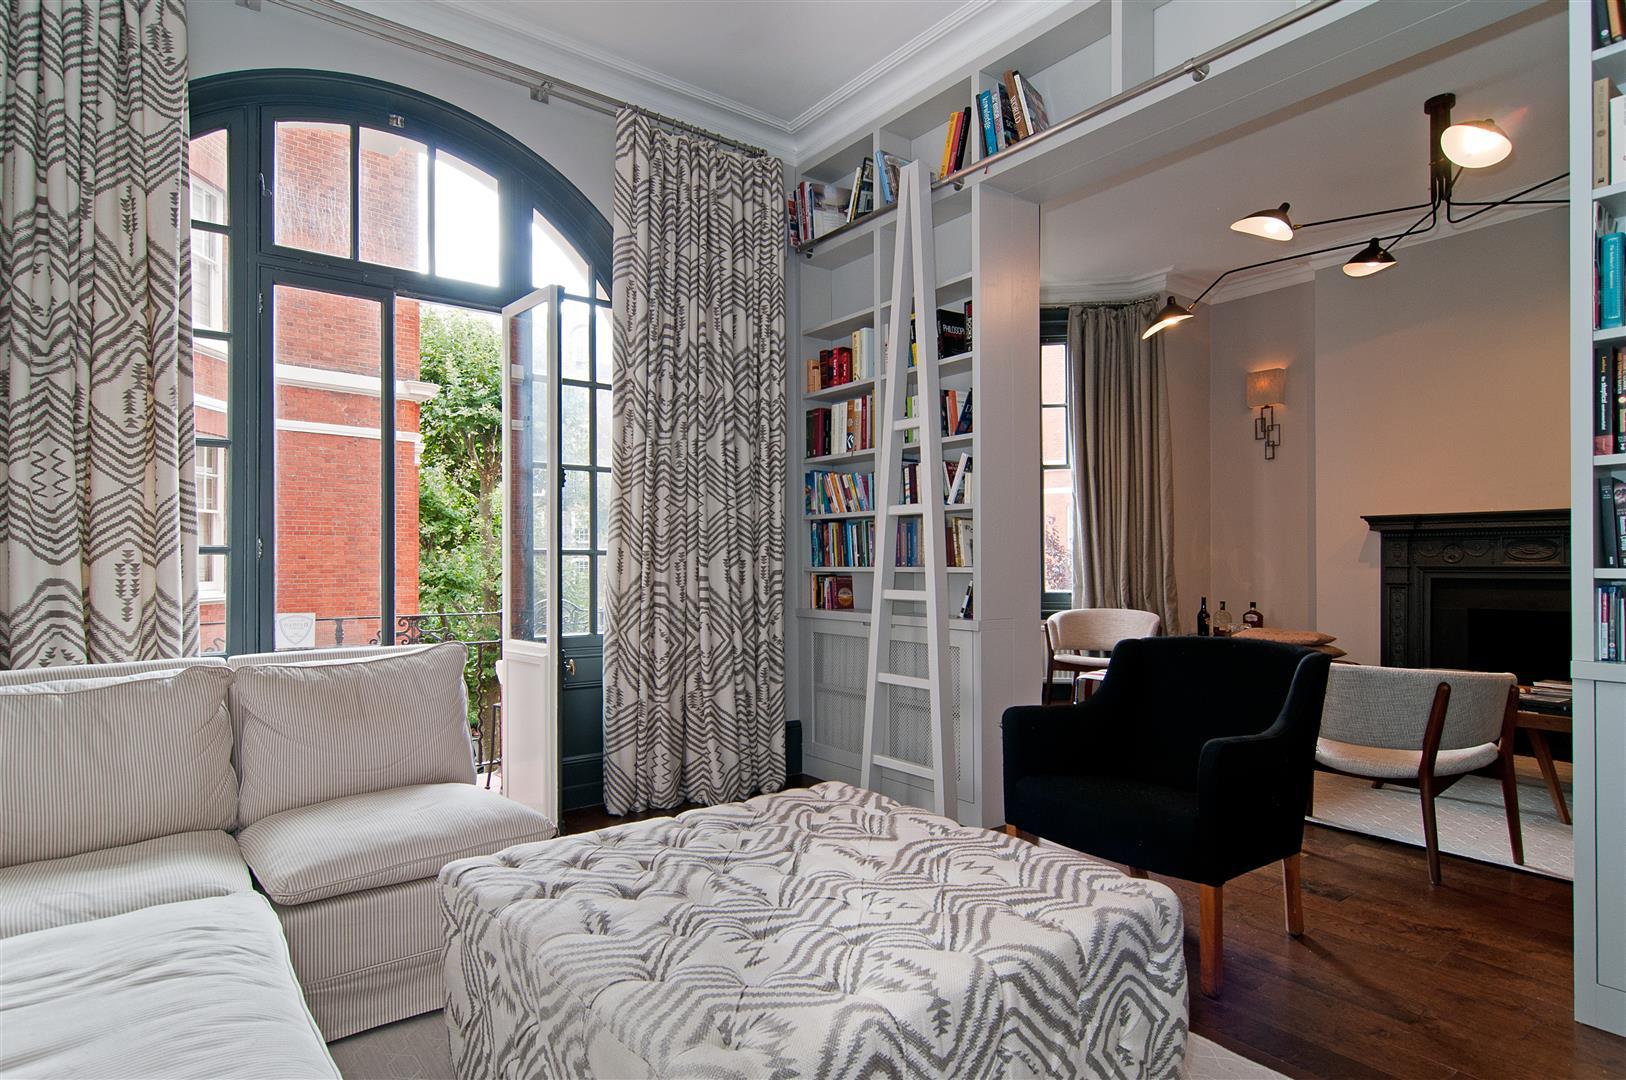 3 Bedrooms Flat for sale in Fitzjames Avenue, West Kensington, London, W14